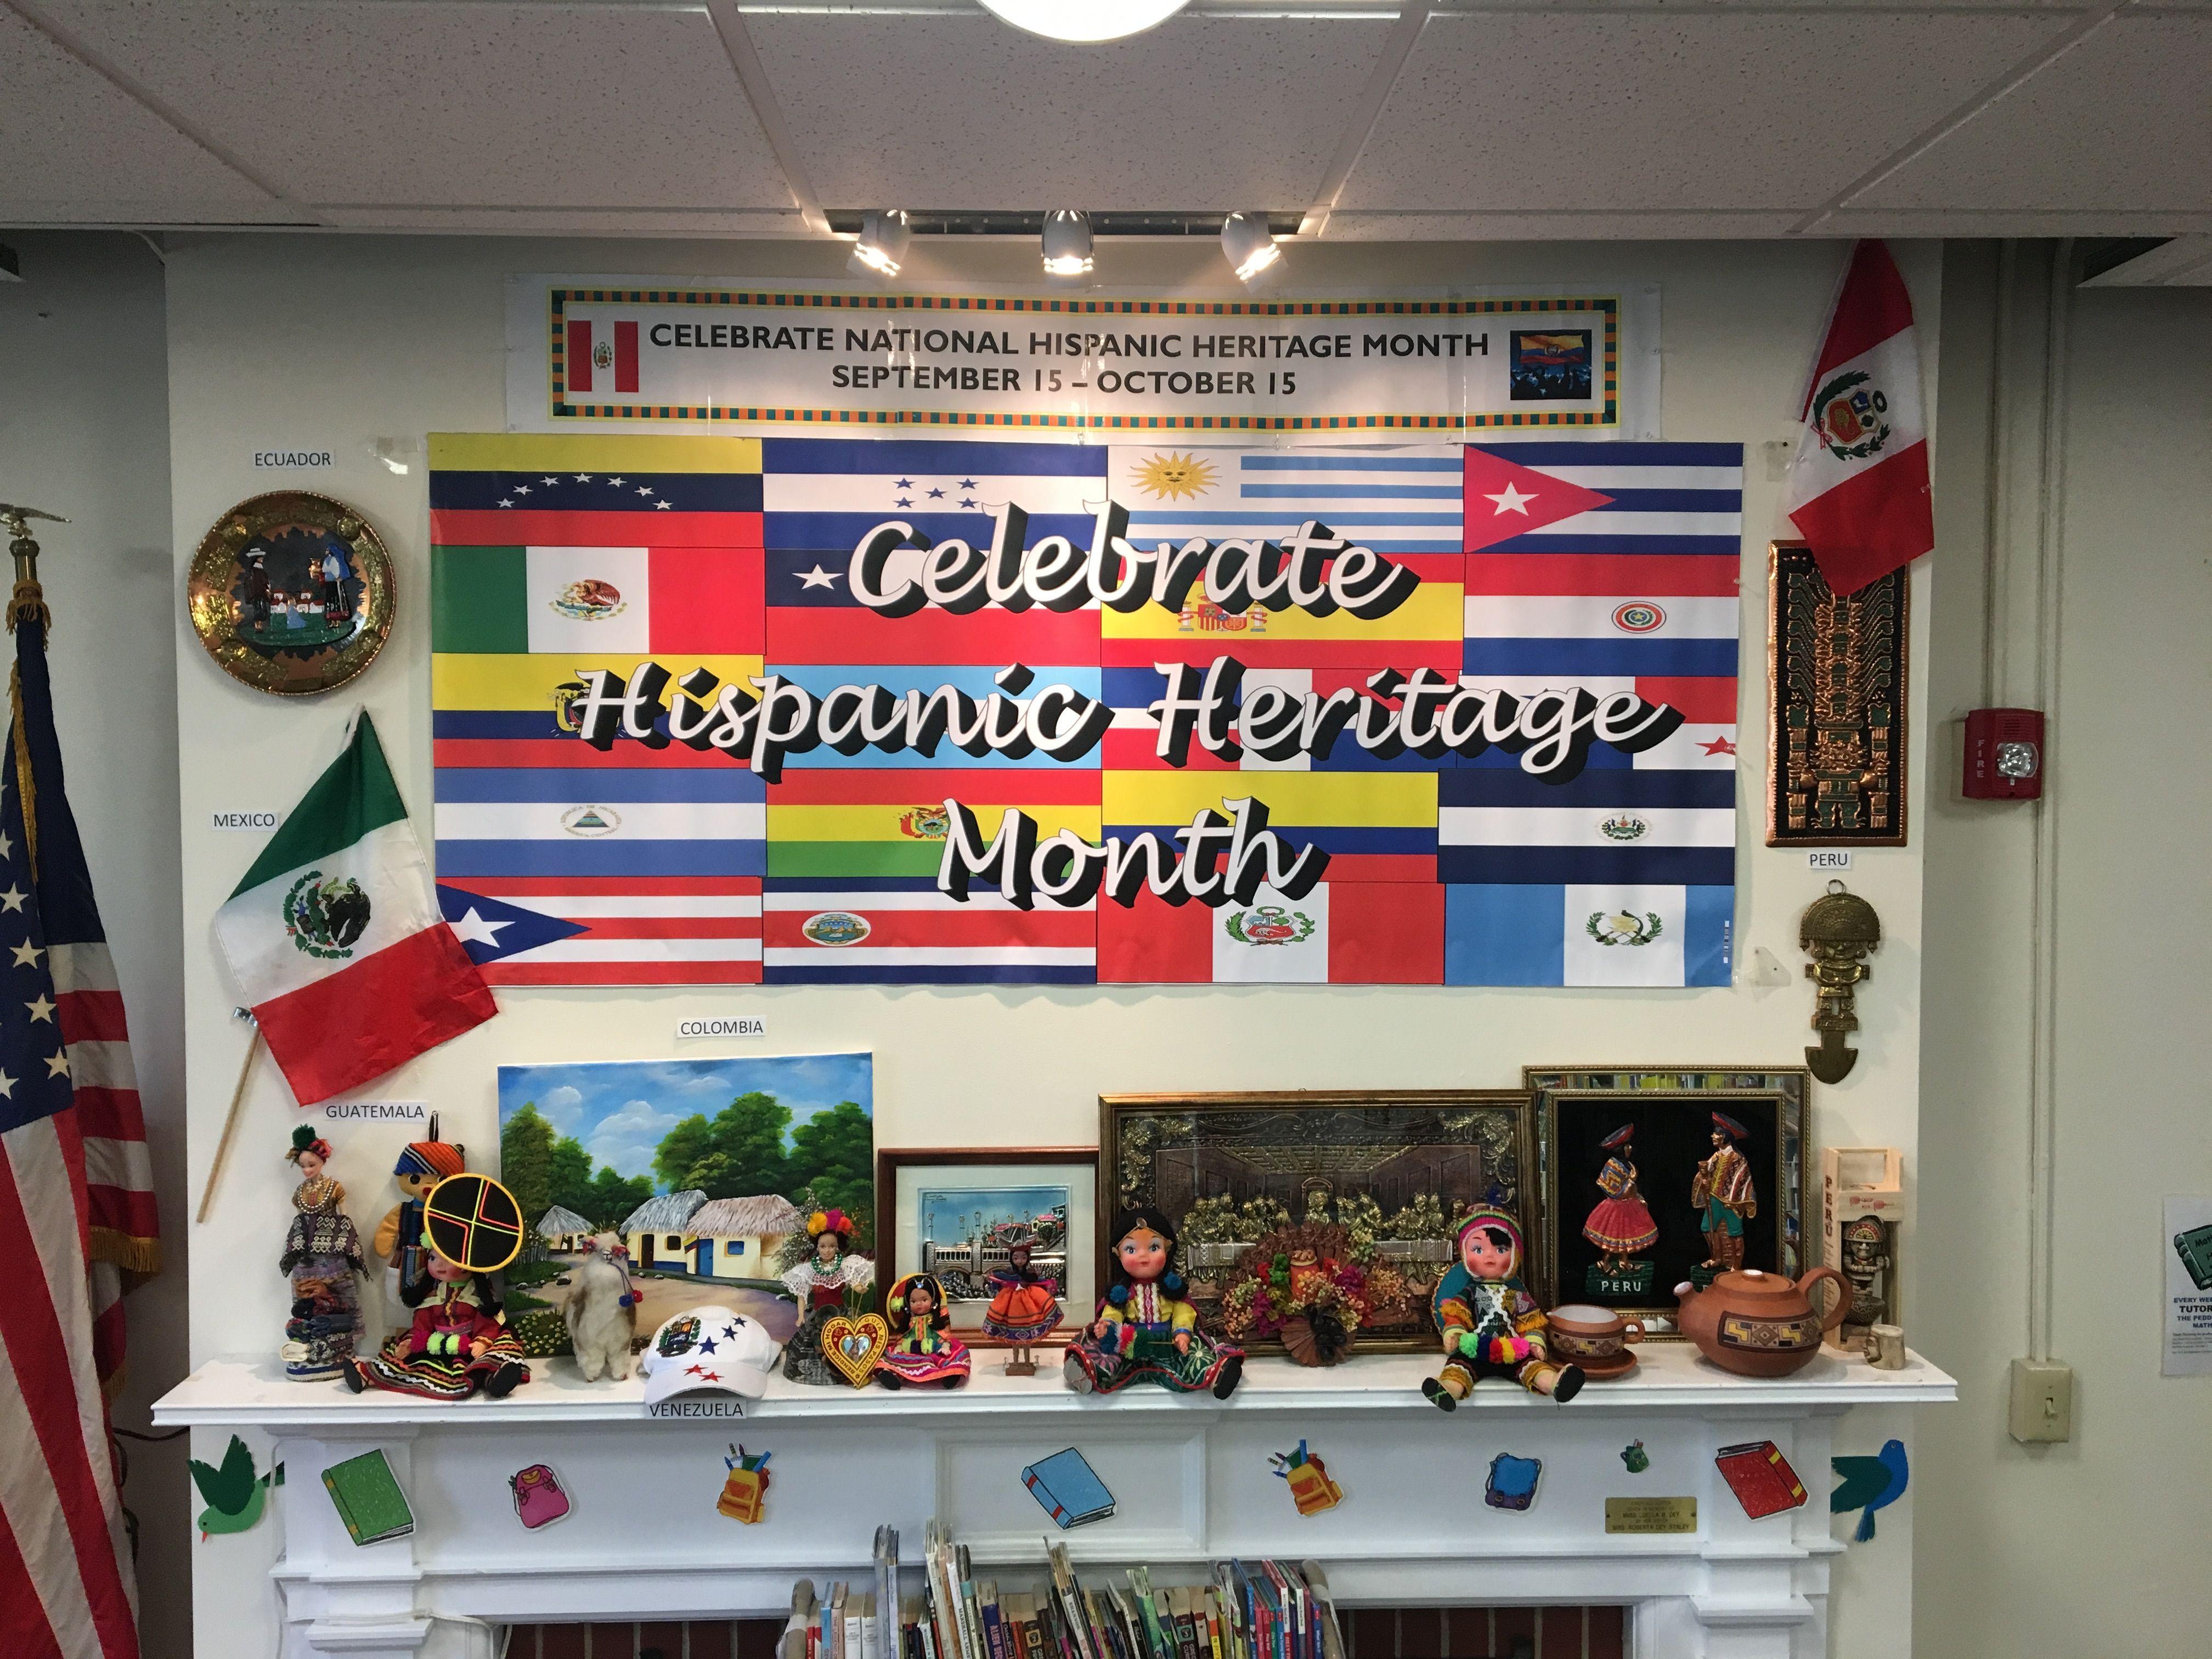 Hispanic Heritage Display At The Hightstown Branch